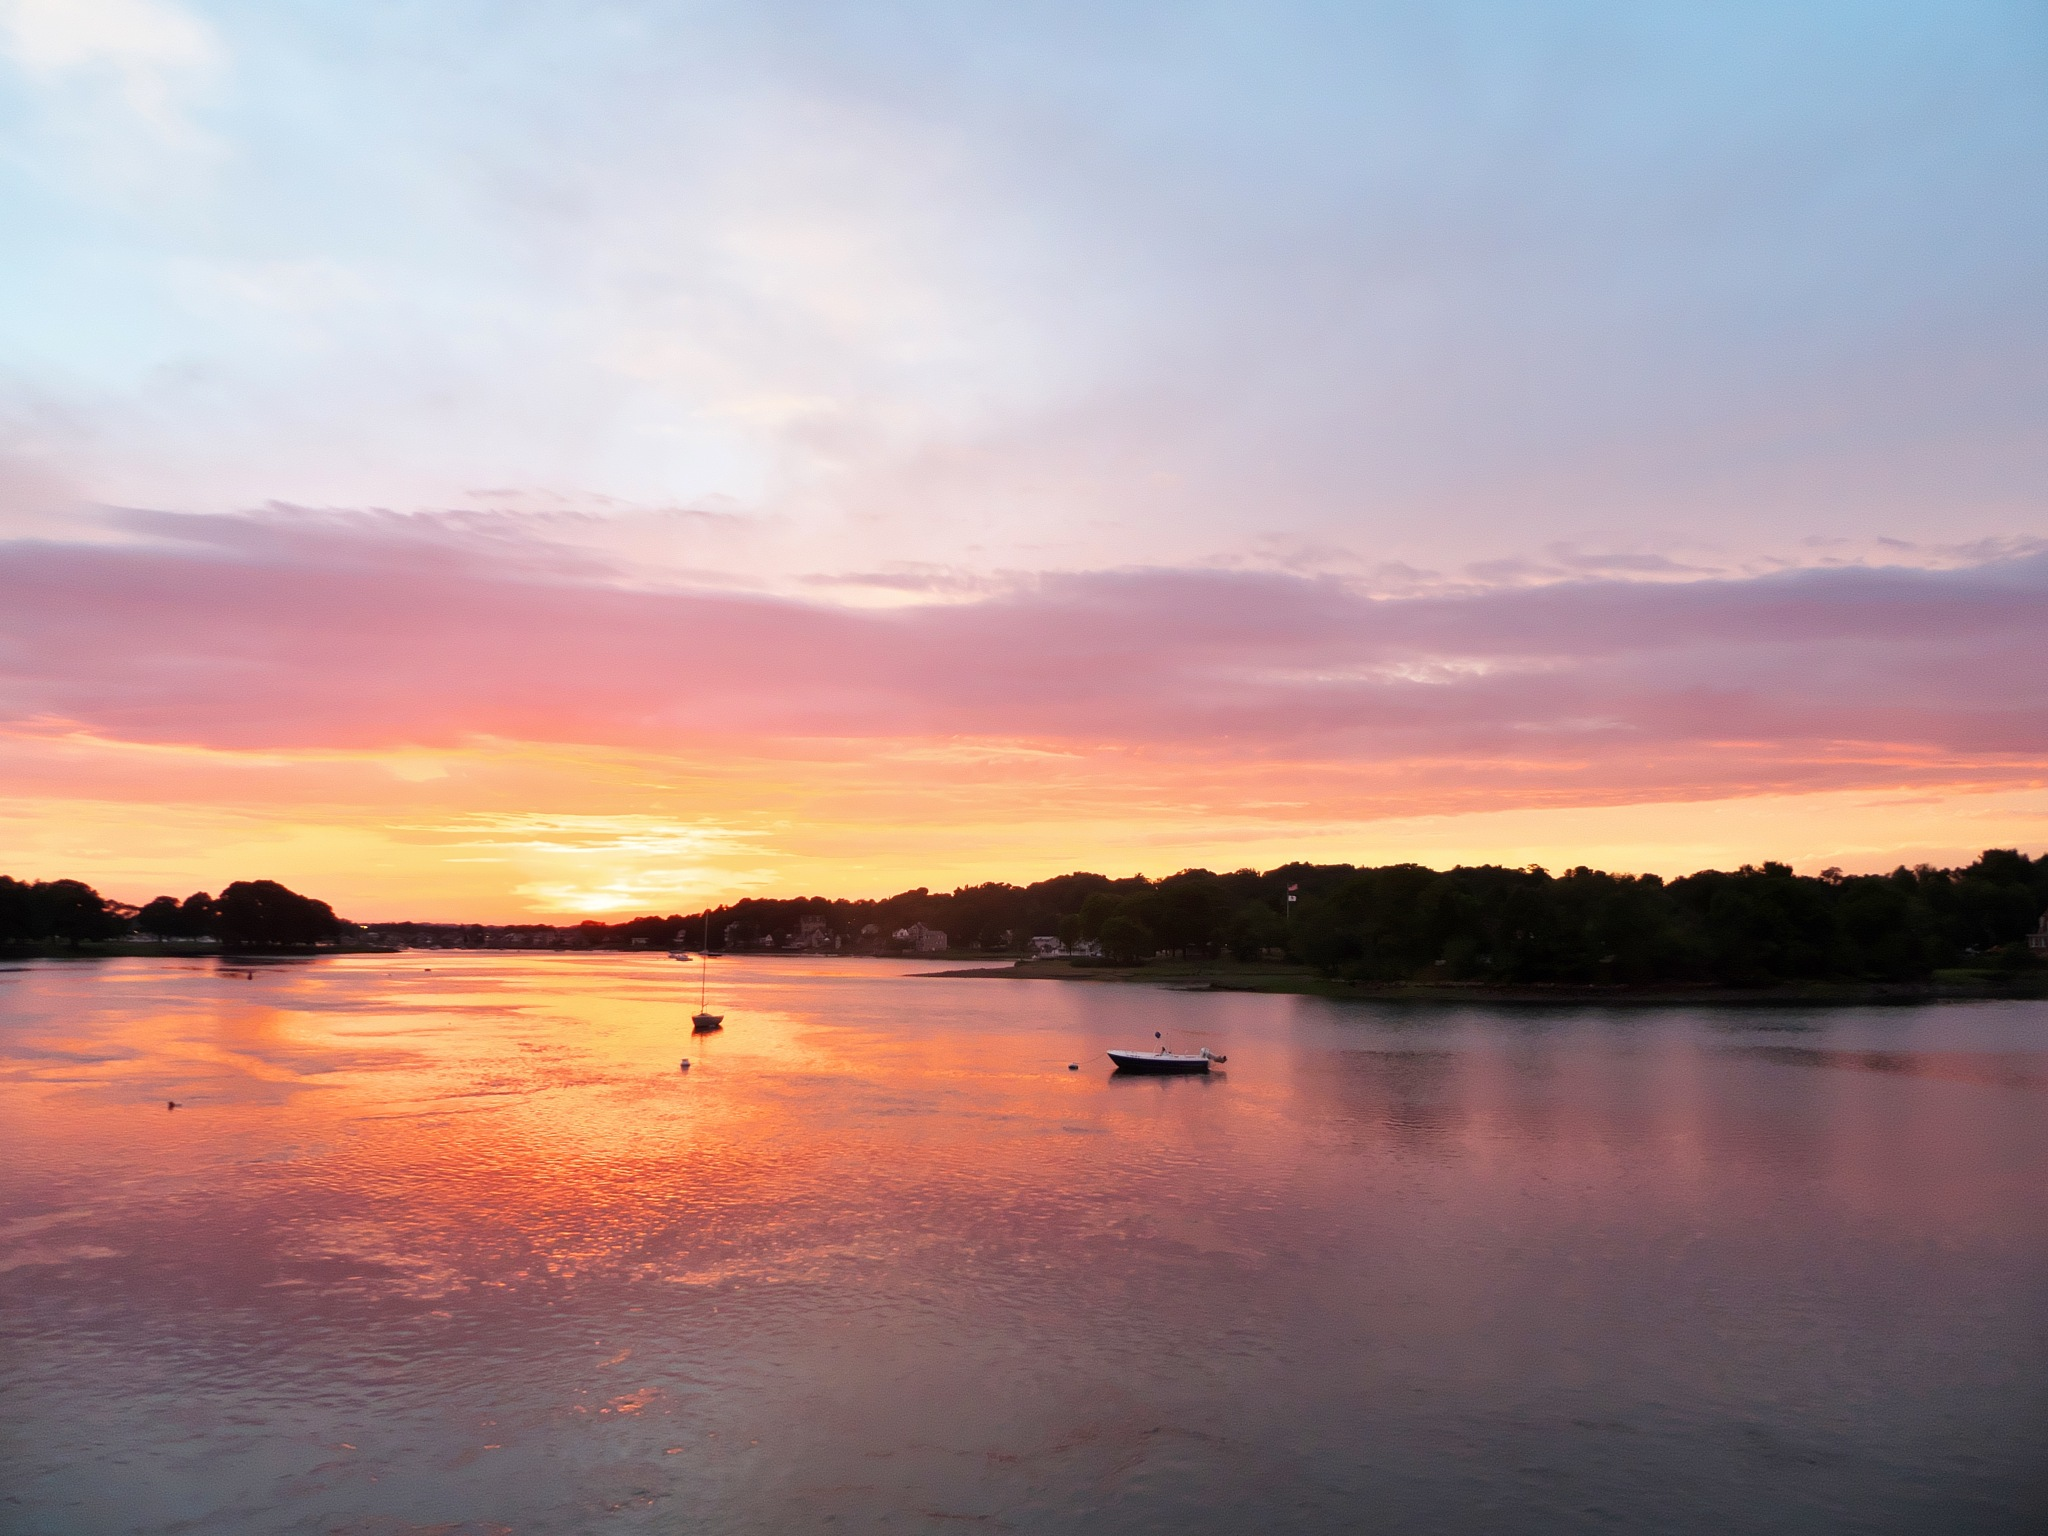 Danvers River Sunset by D. Scott Hufford